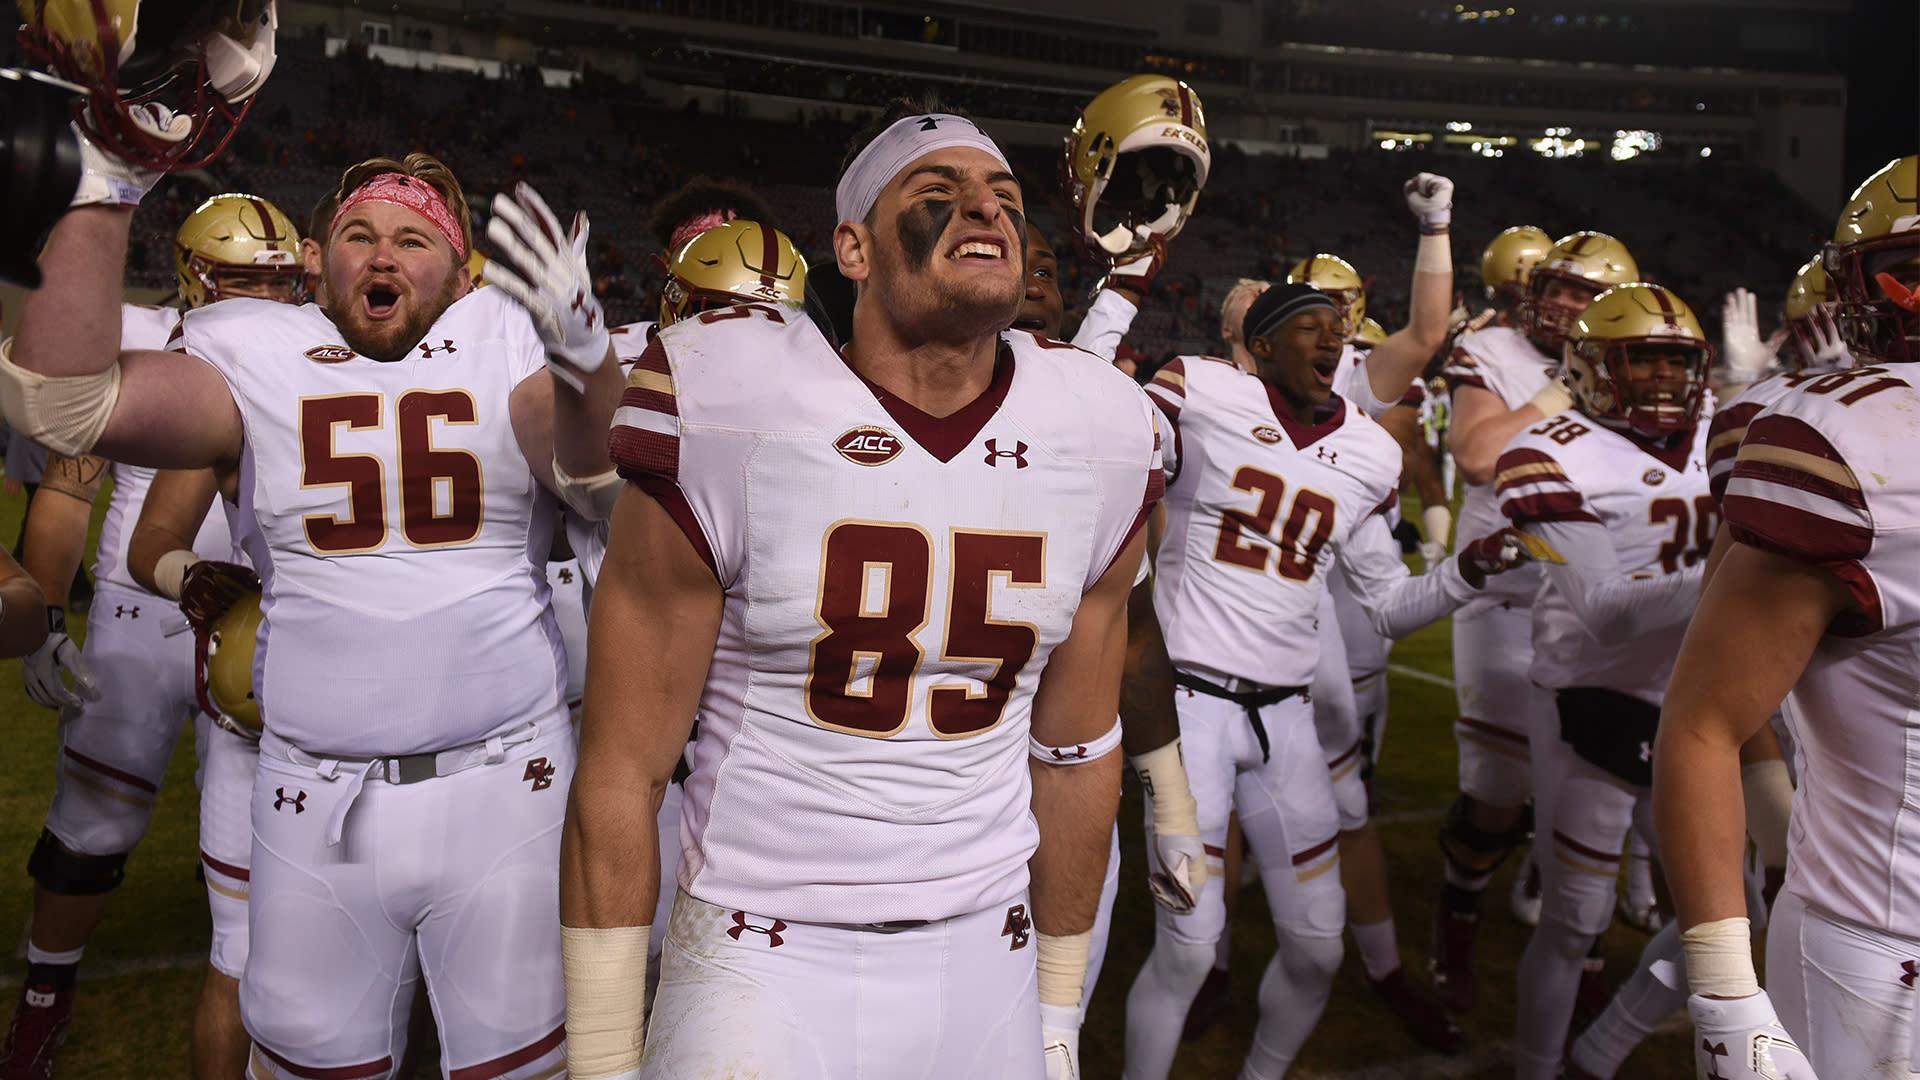 Unlikely Region Plays Host To College Footballs Biggest